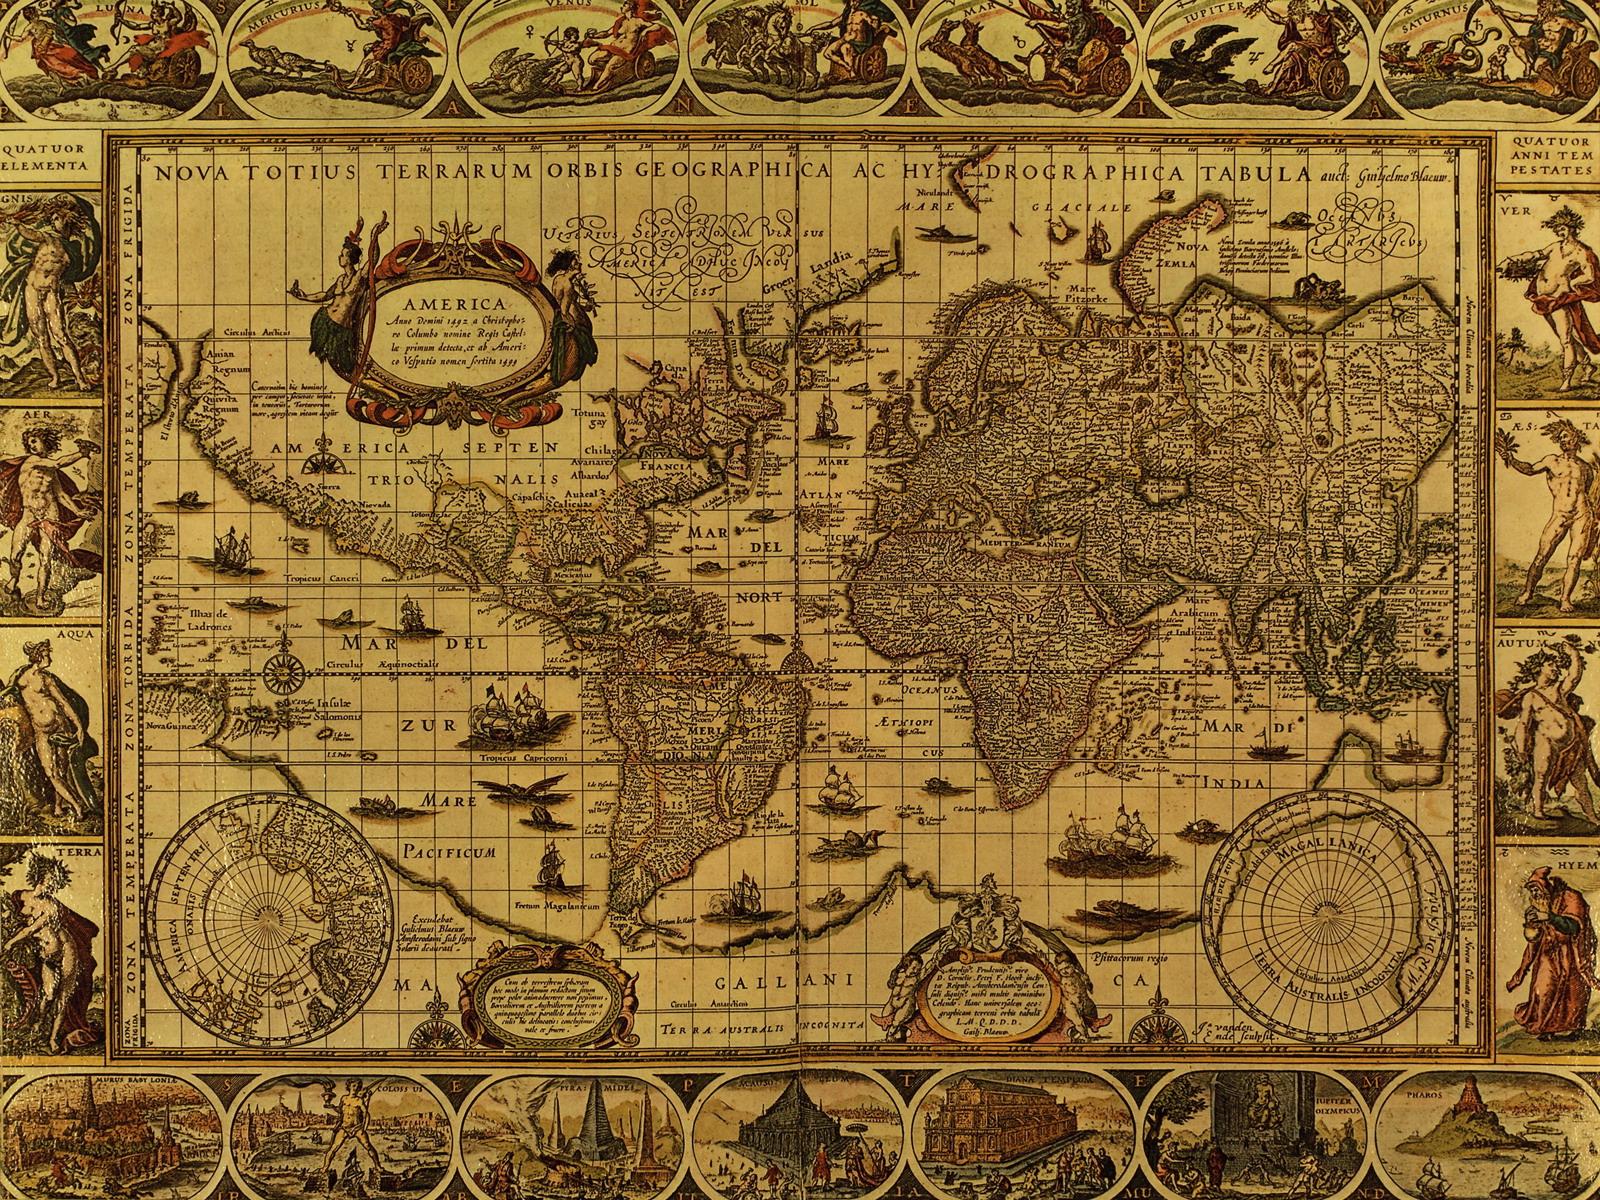 Stare geografske mape i karte - Page 6 031_Antique%2BWorld%2BMap%2BCirca%2B1499